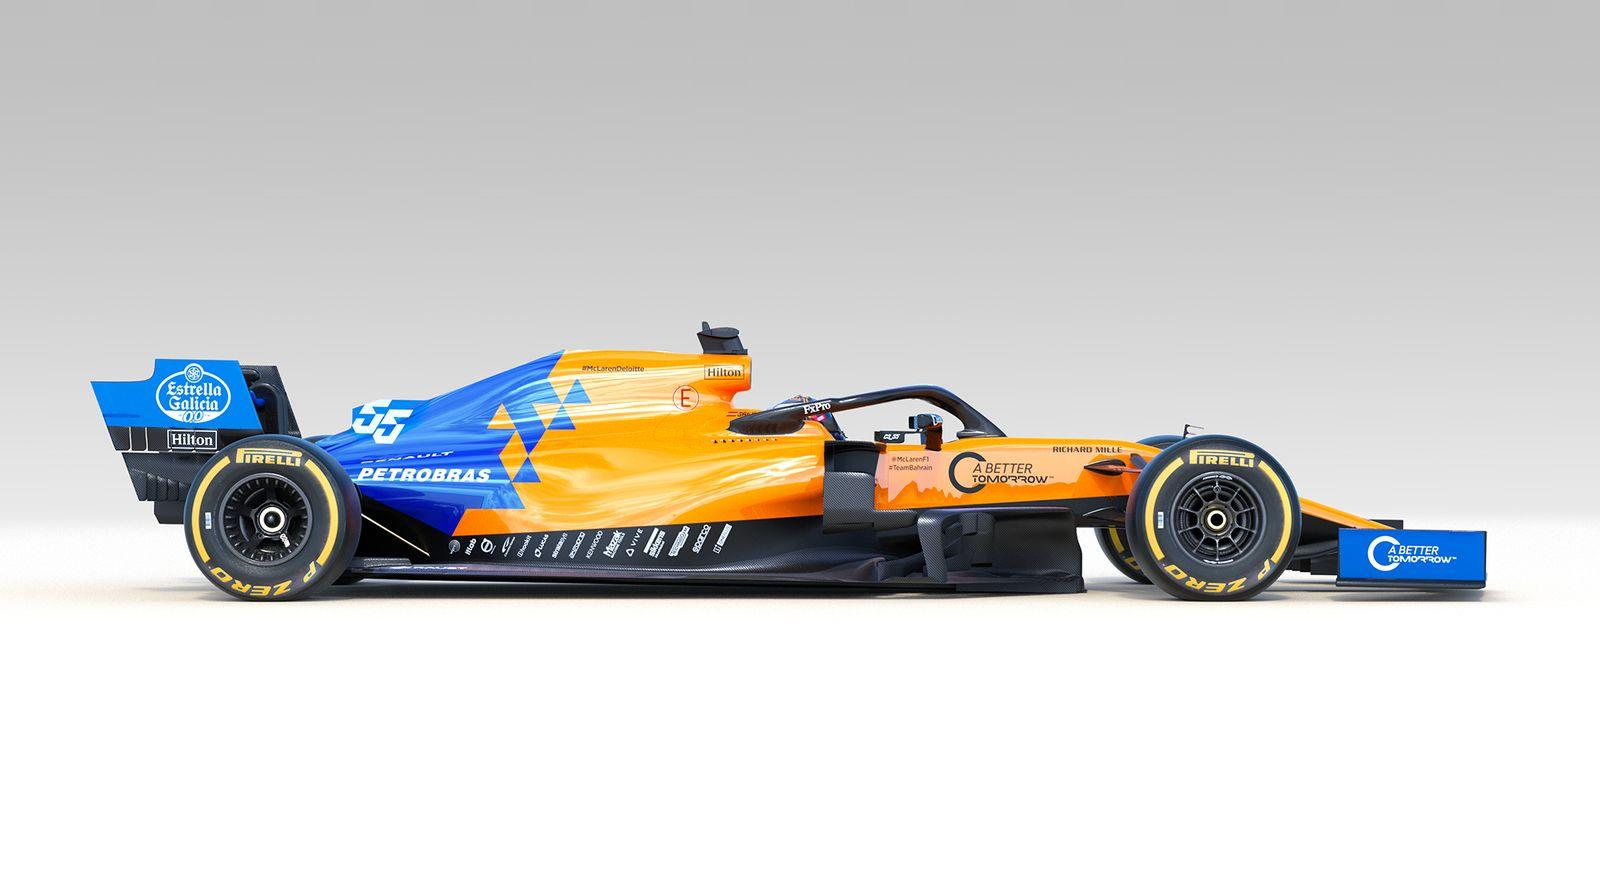 Svelata la McLaren MCL34